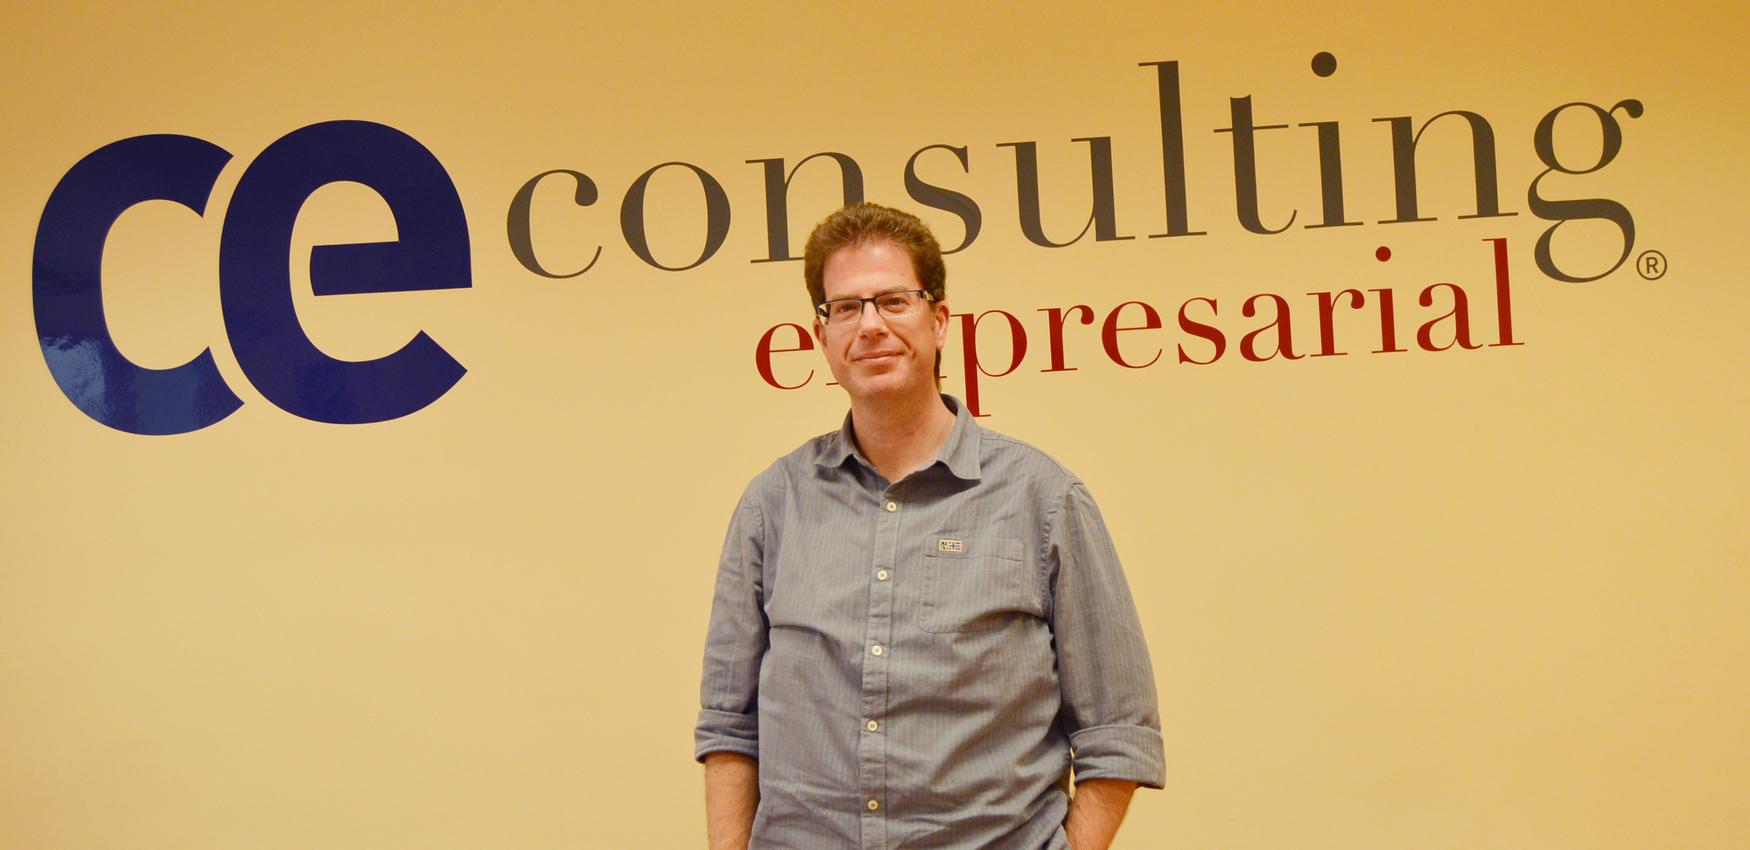 Jose Humberto González, director de la oficina CE Consulting Barcelona - Mataró